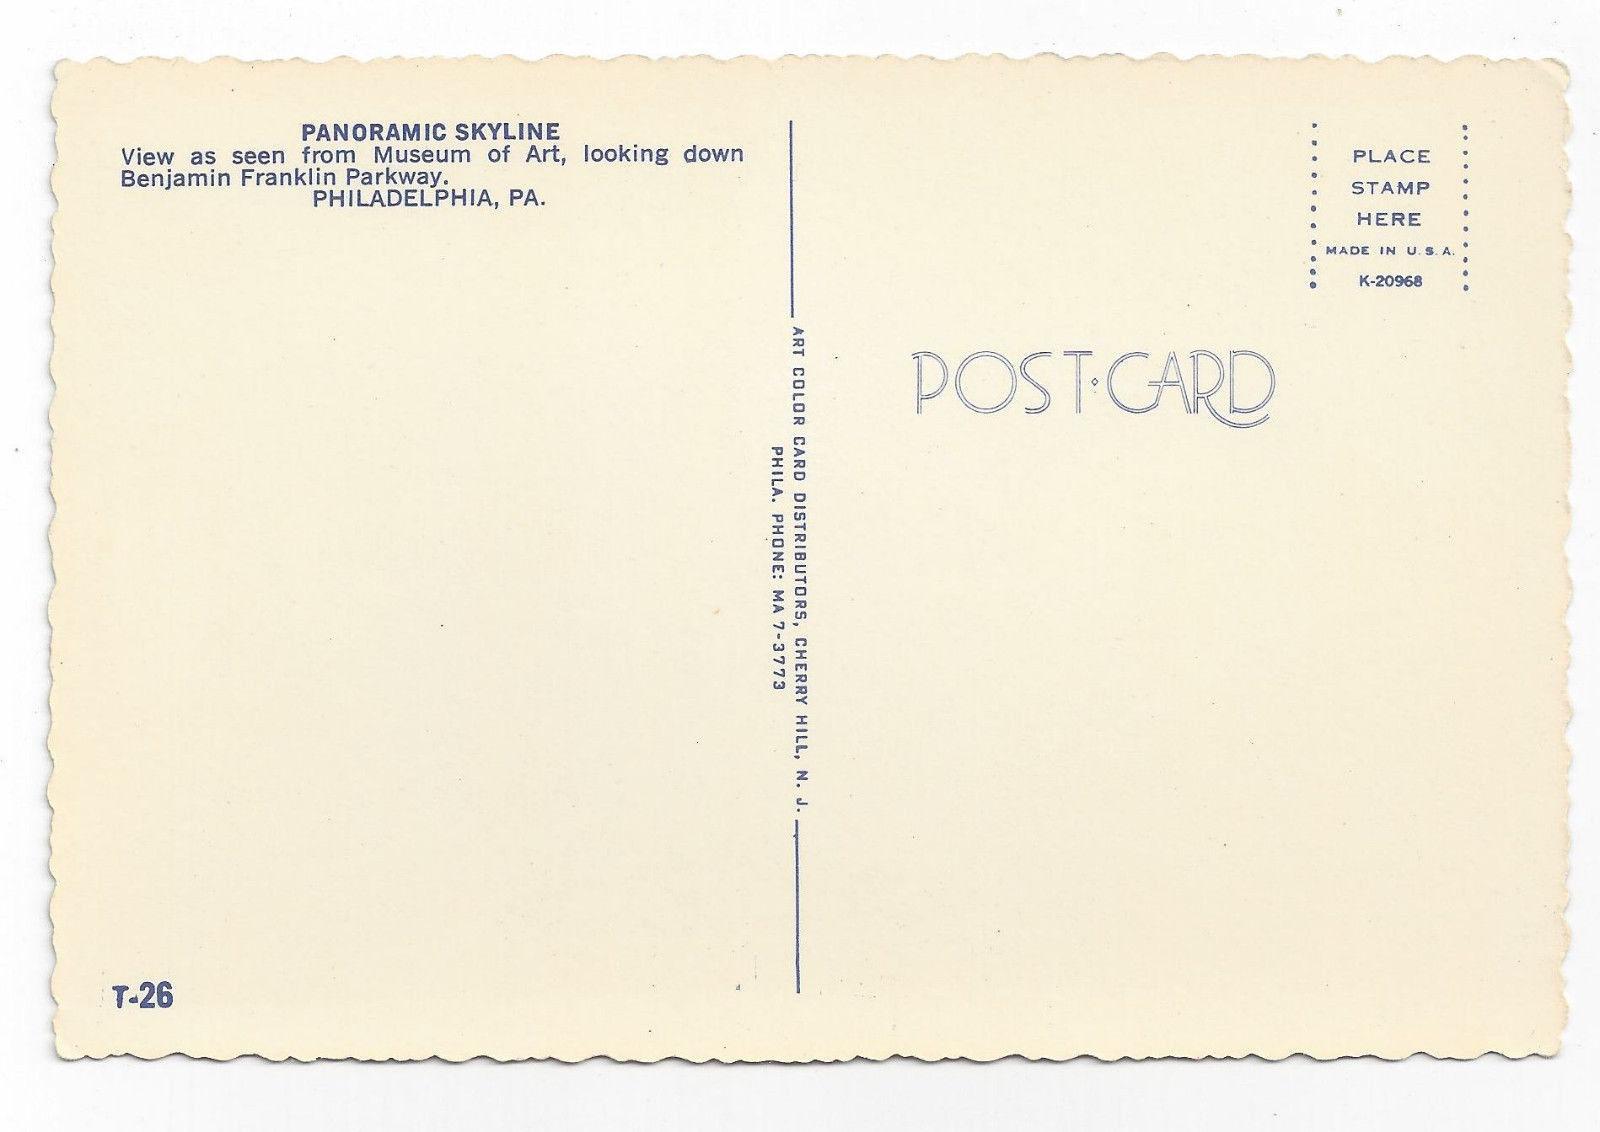 Philadelphia PA Panoramic Skyline Parkway Eakins Oval City Hall 4X6 Postcard